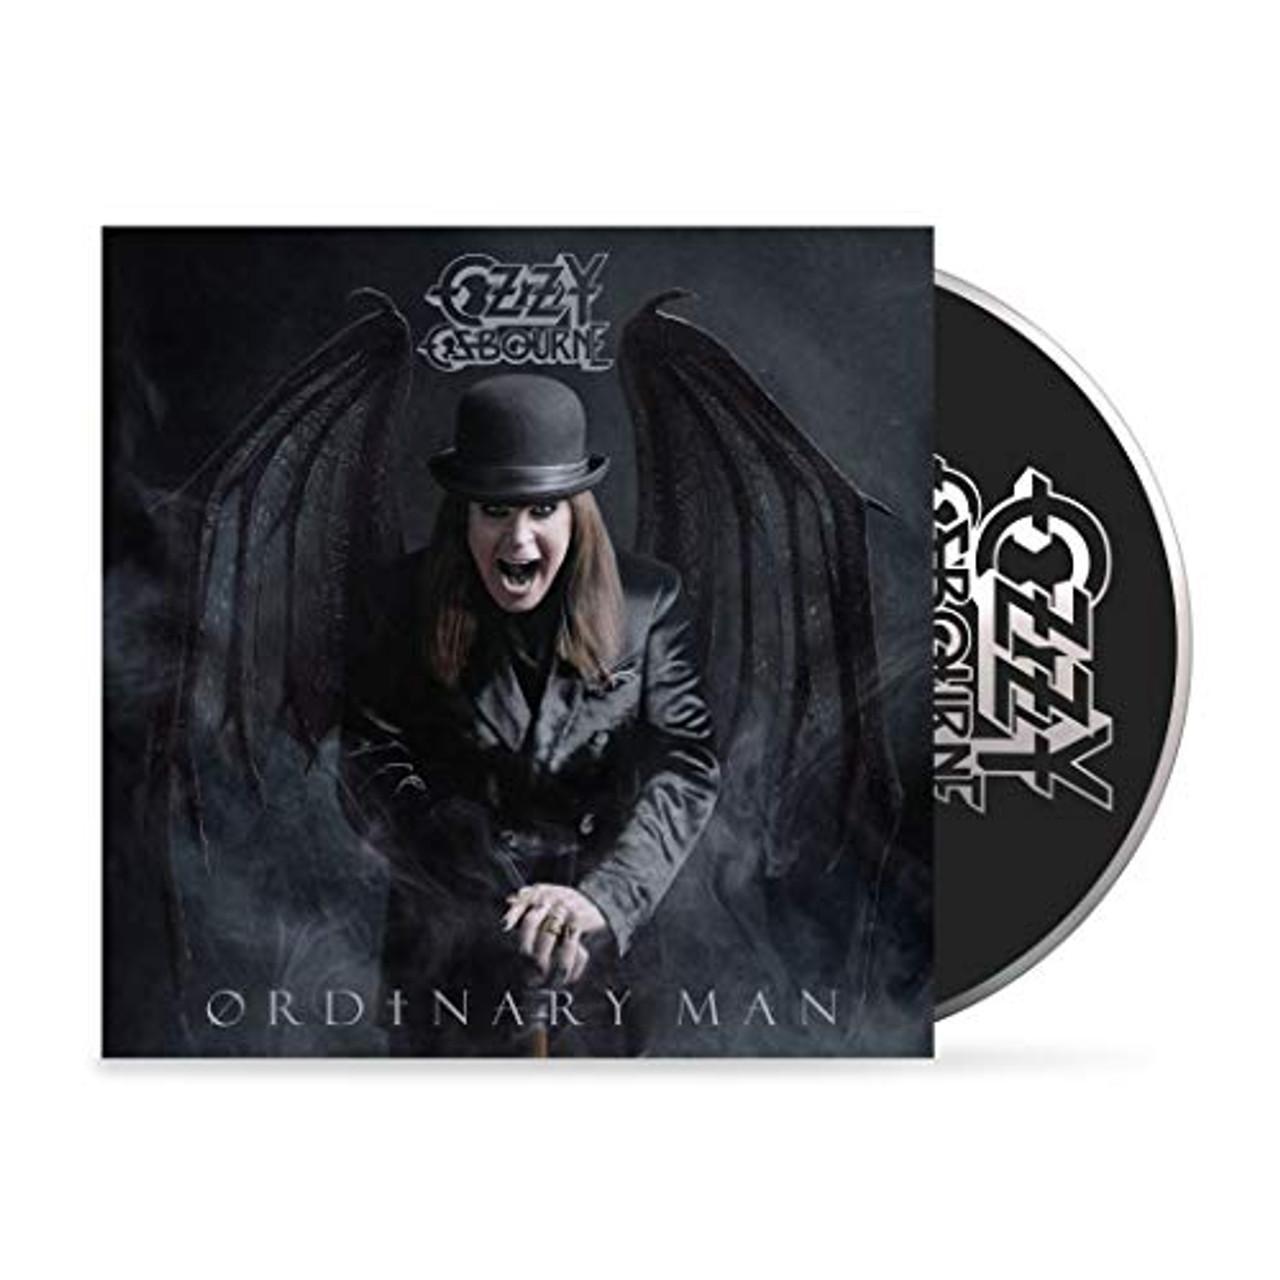 Ozzy Osbourne - Ordinary Man (#194397184525)